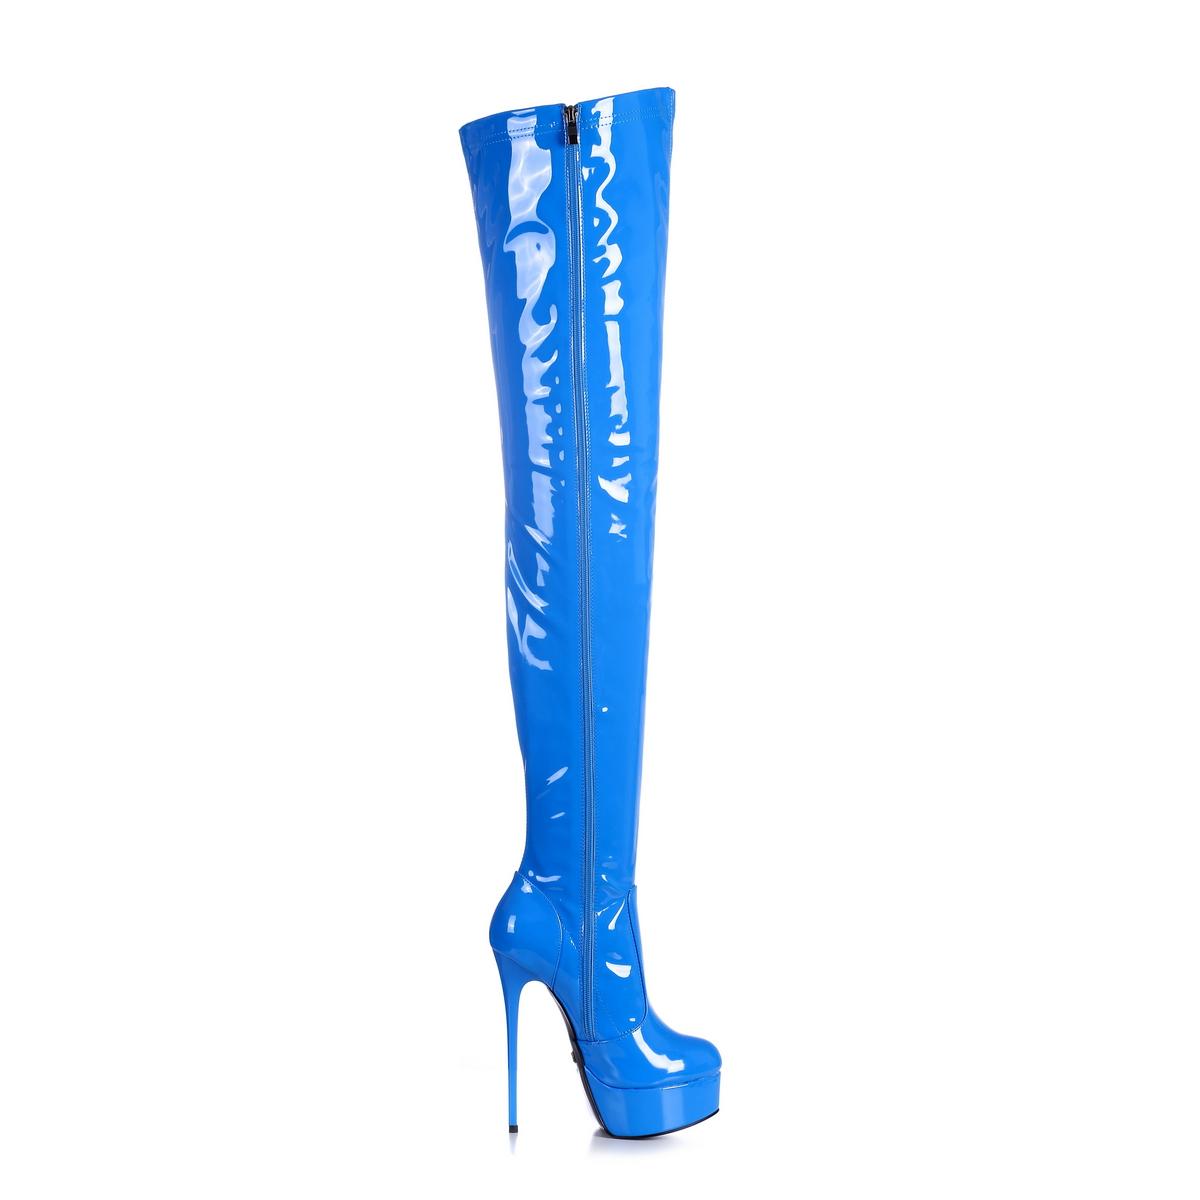 Giaro Galana 1004 Overknee Stiefel in Übergrößen Blau große Damenschuhe – Bild 4